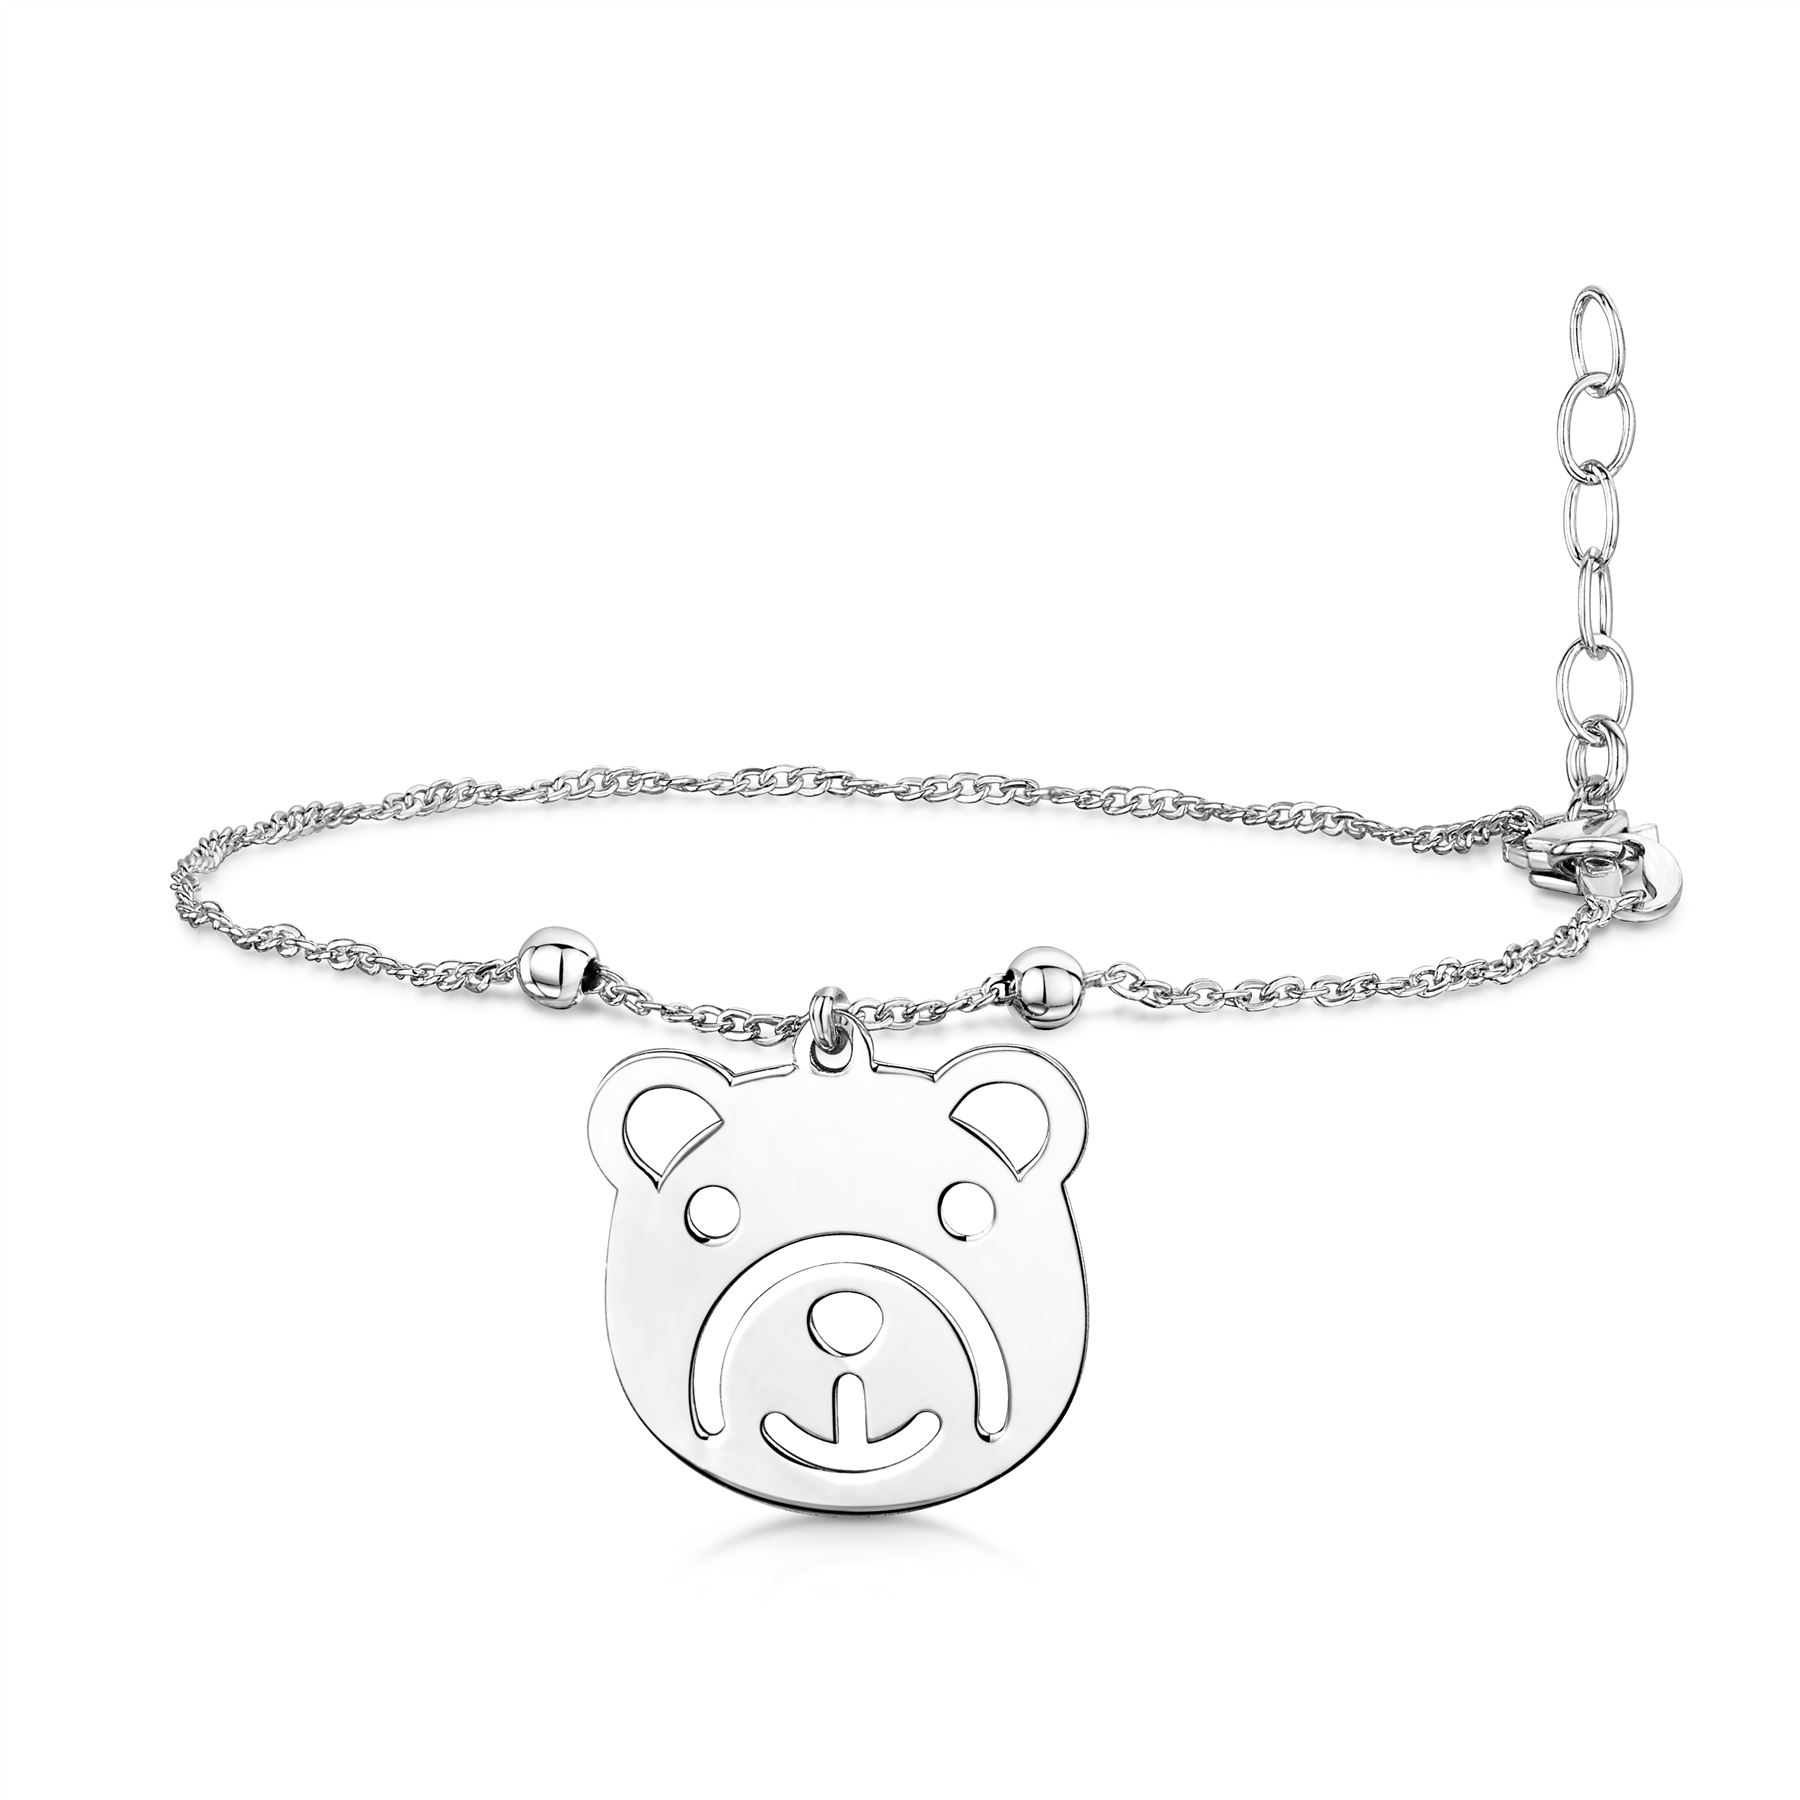 Amberta-Jewelry-925-Sterling-Silver-Adjustable-Bracelet-Italian-Bangle-for-Women miniature 30